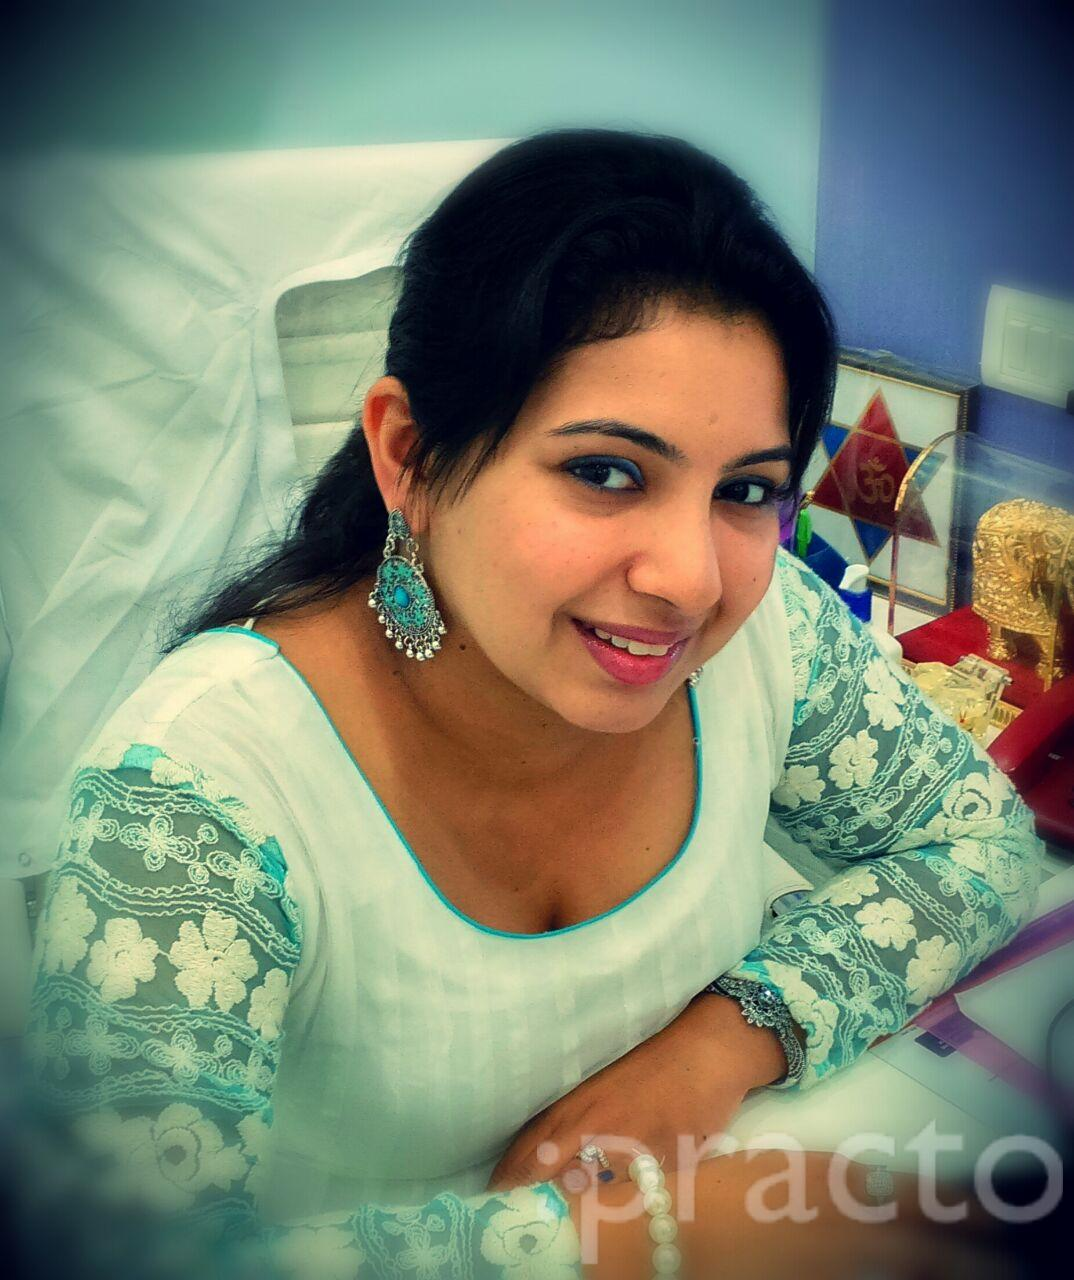 Dr. Pooja Shetty - Dentist